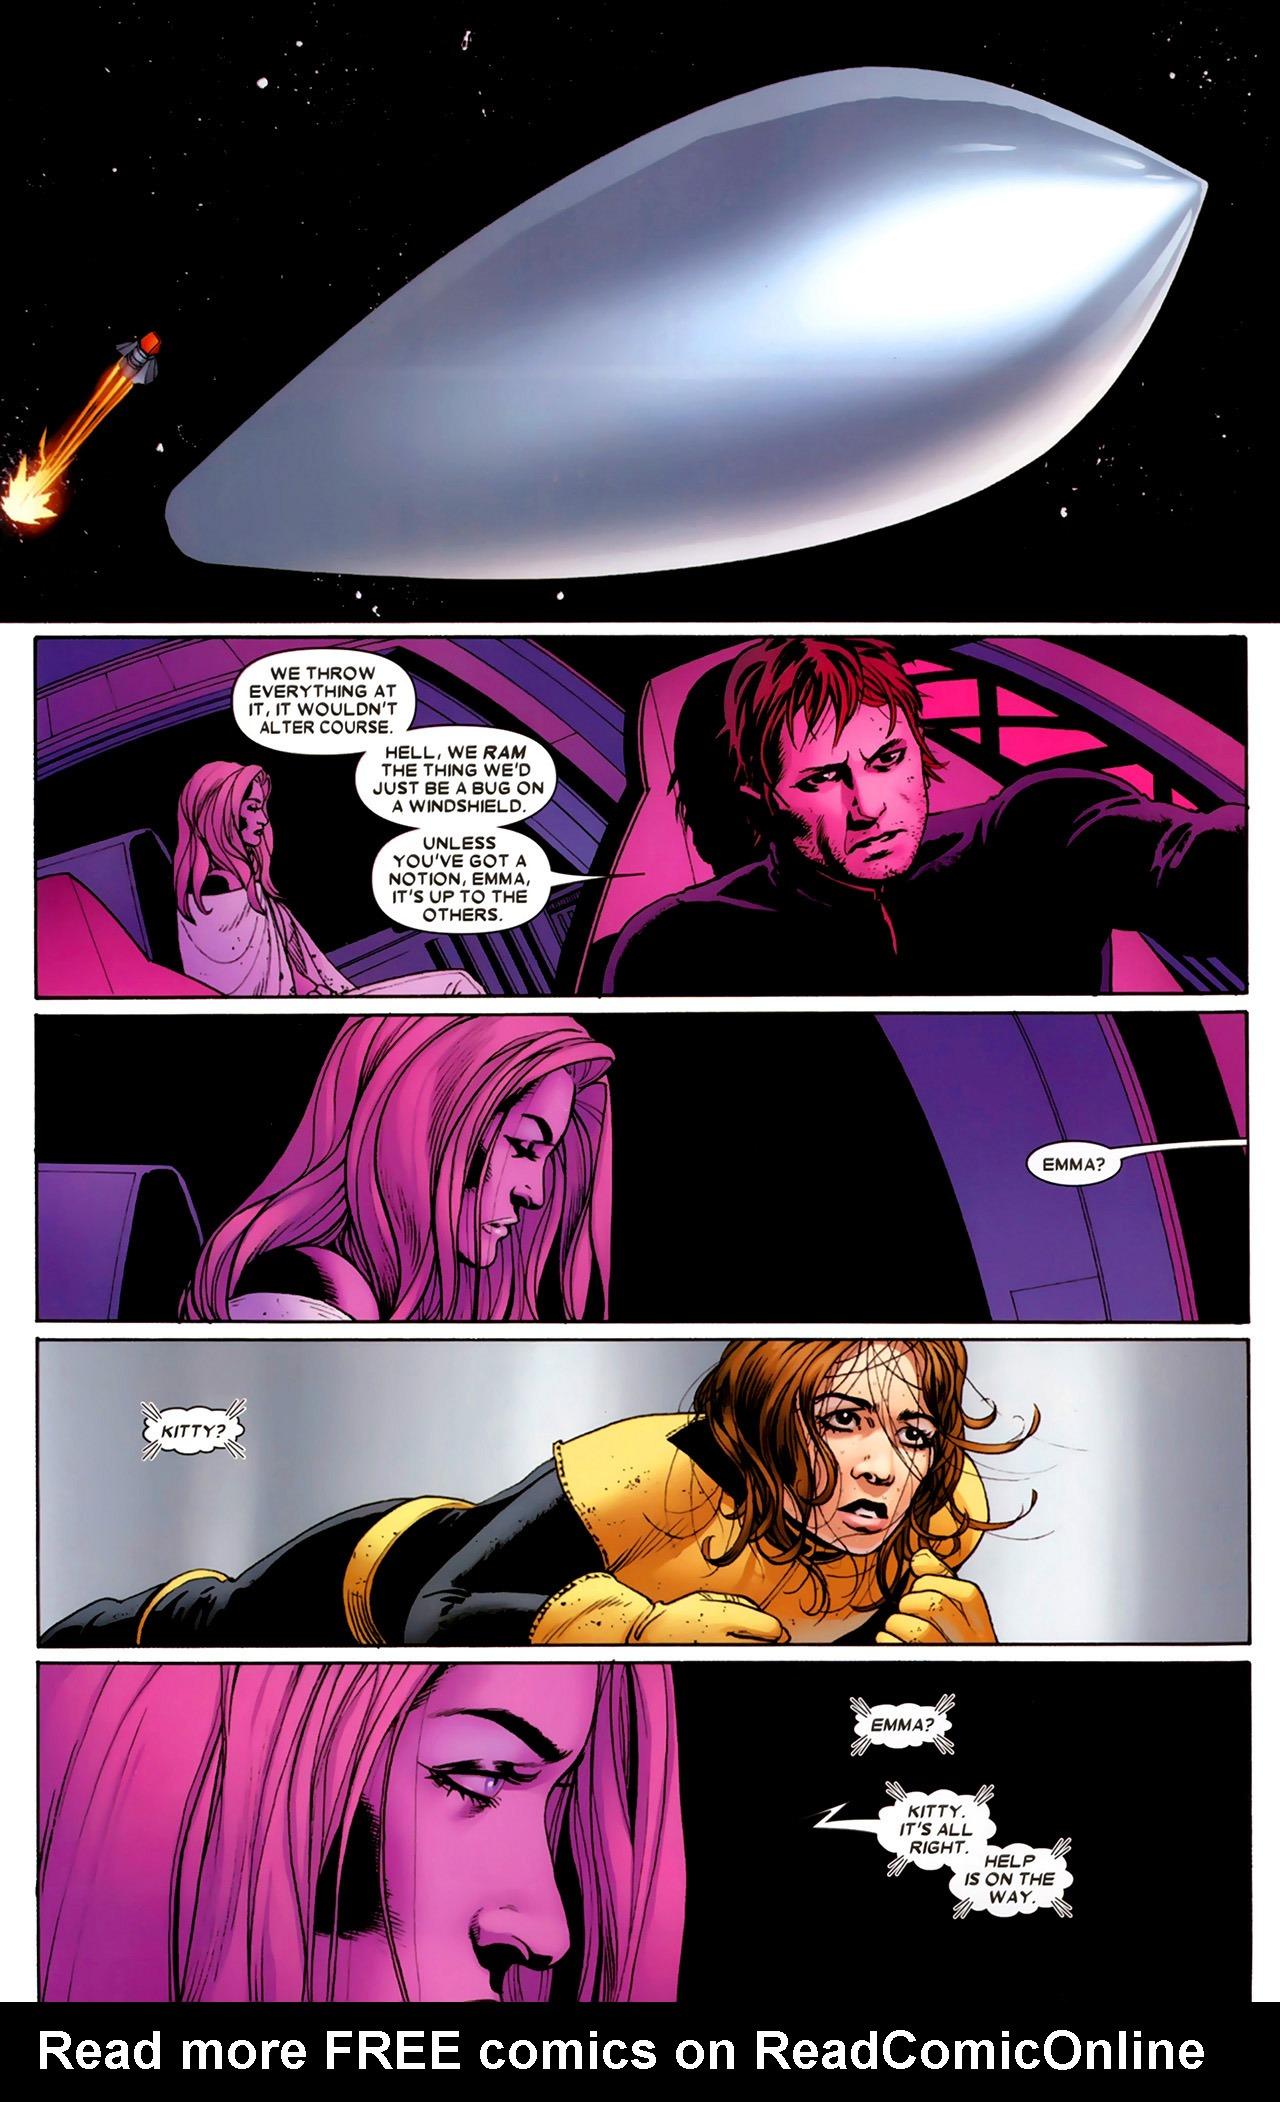 Read online Giant-Size Astonishing X-Men comic -  Issue # Full - 23